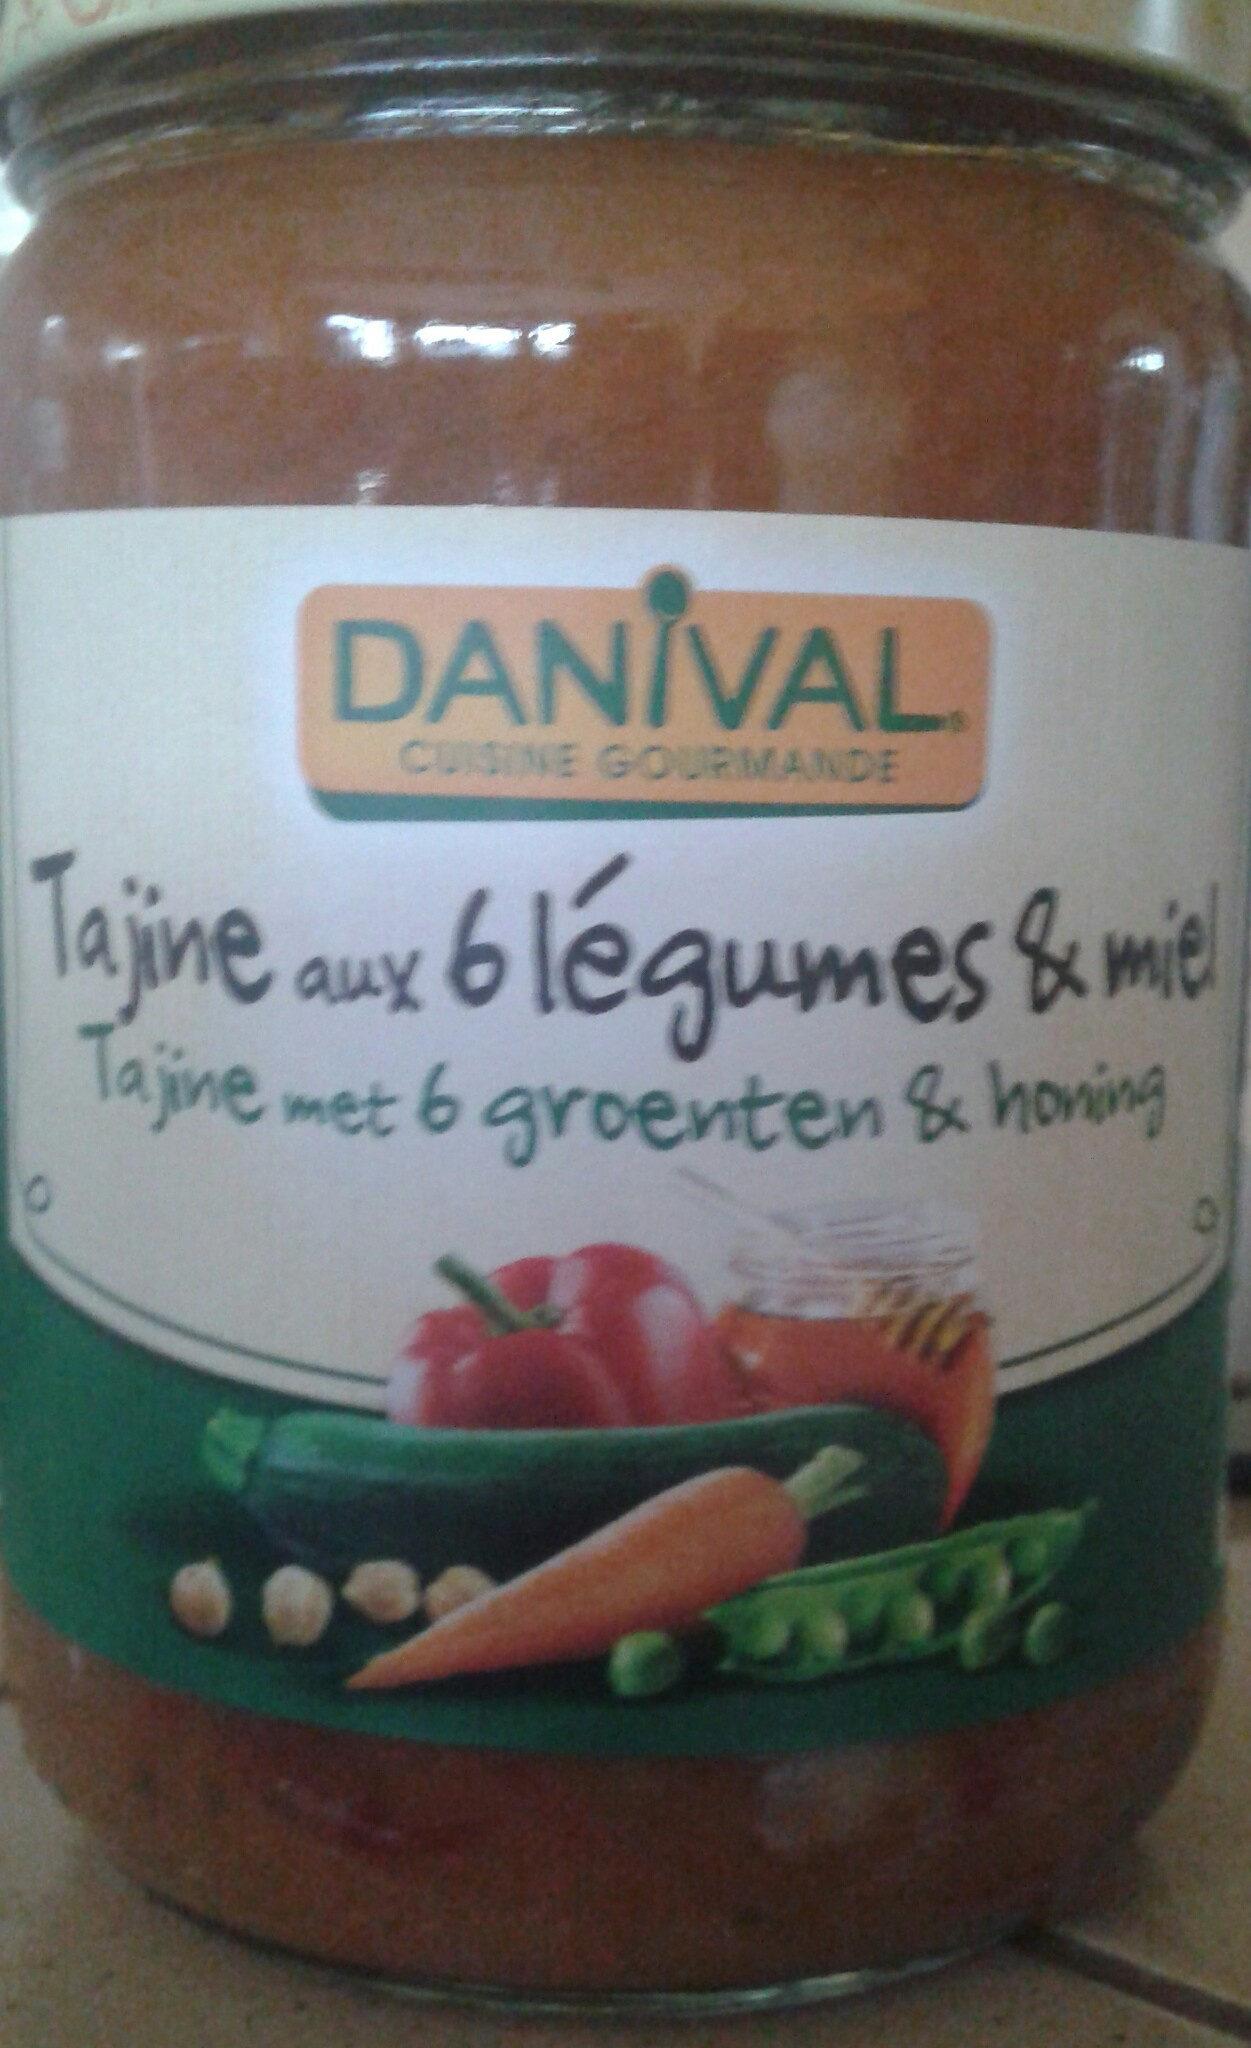 Tajine Aux 6 Légumes & Miel - Product - fr